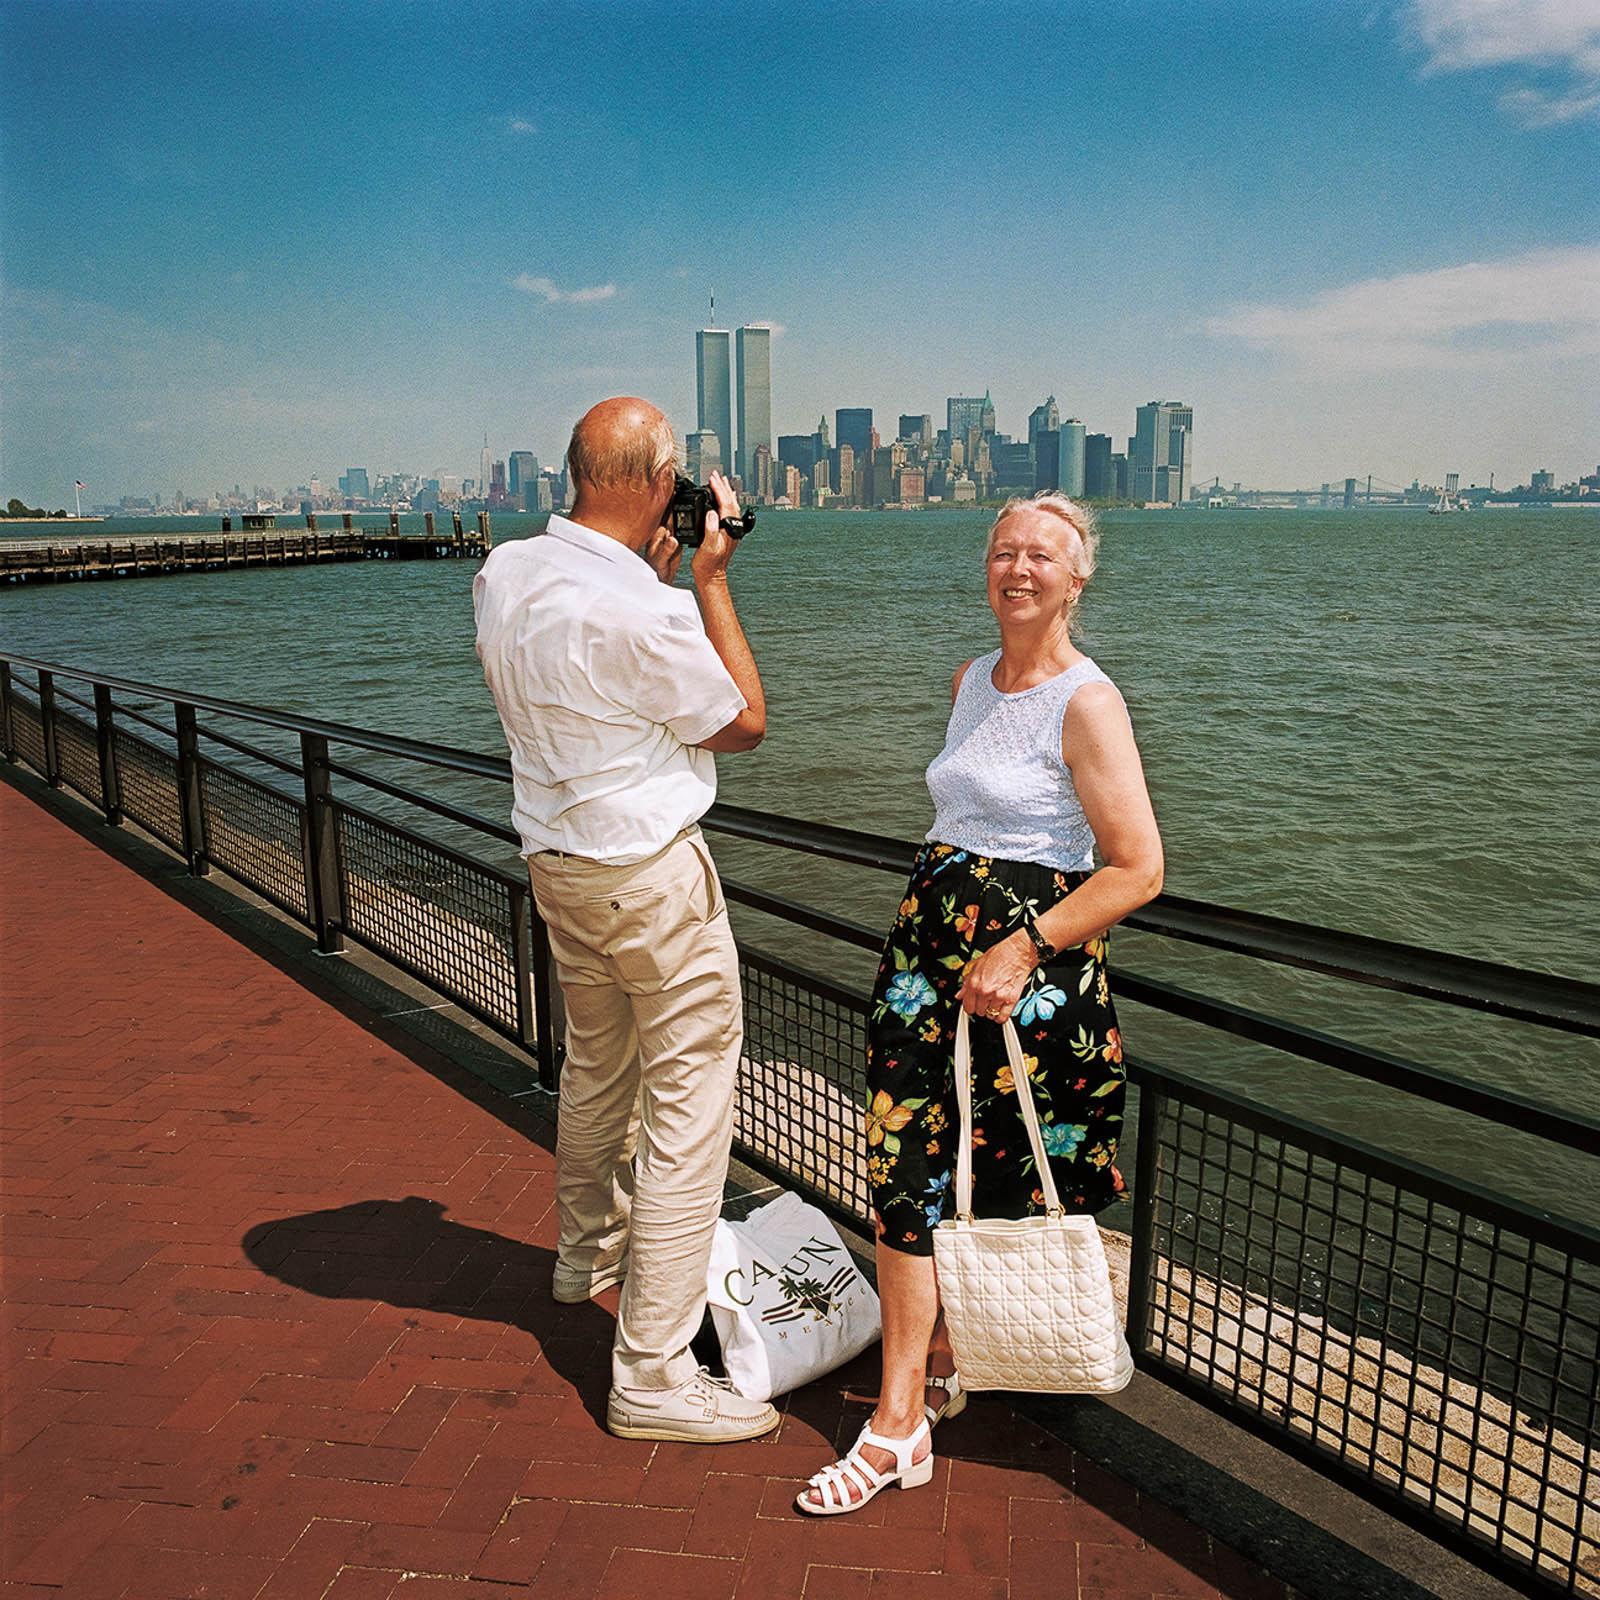 Couple at Statue Liberty Island, New York 2000